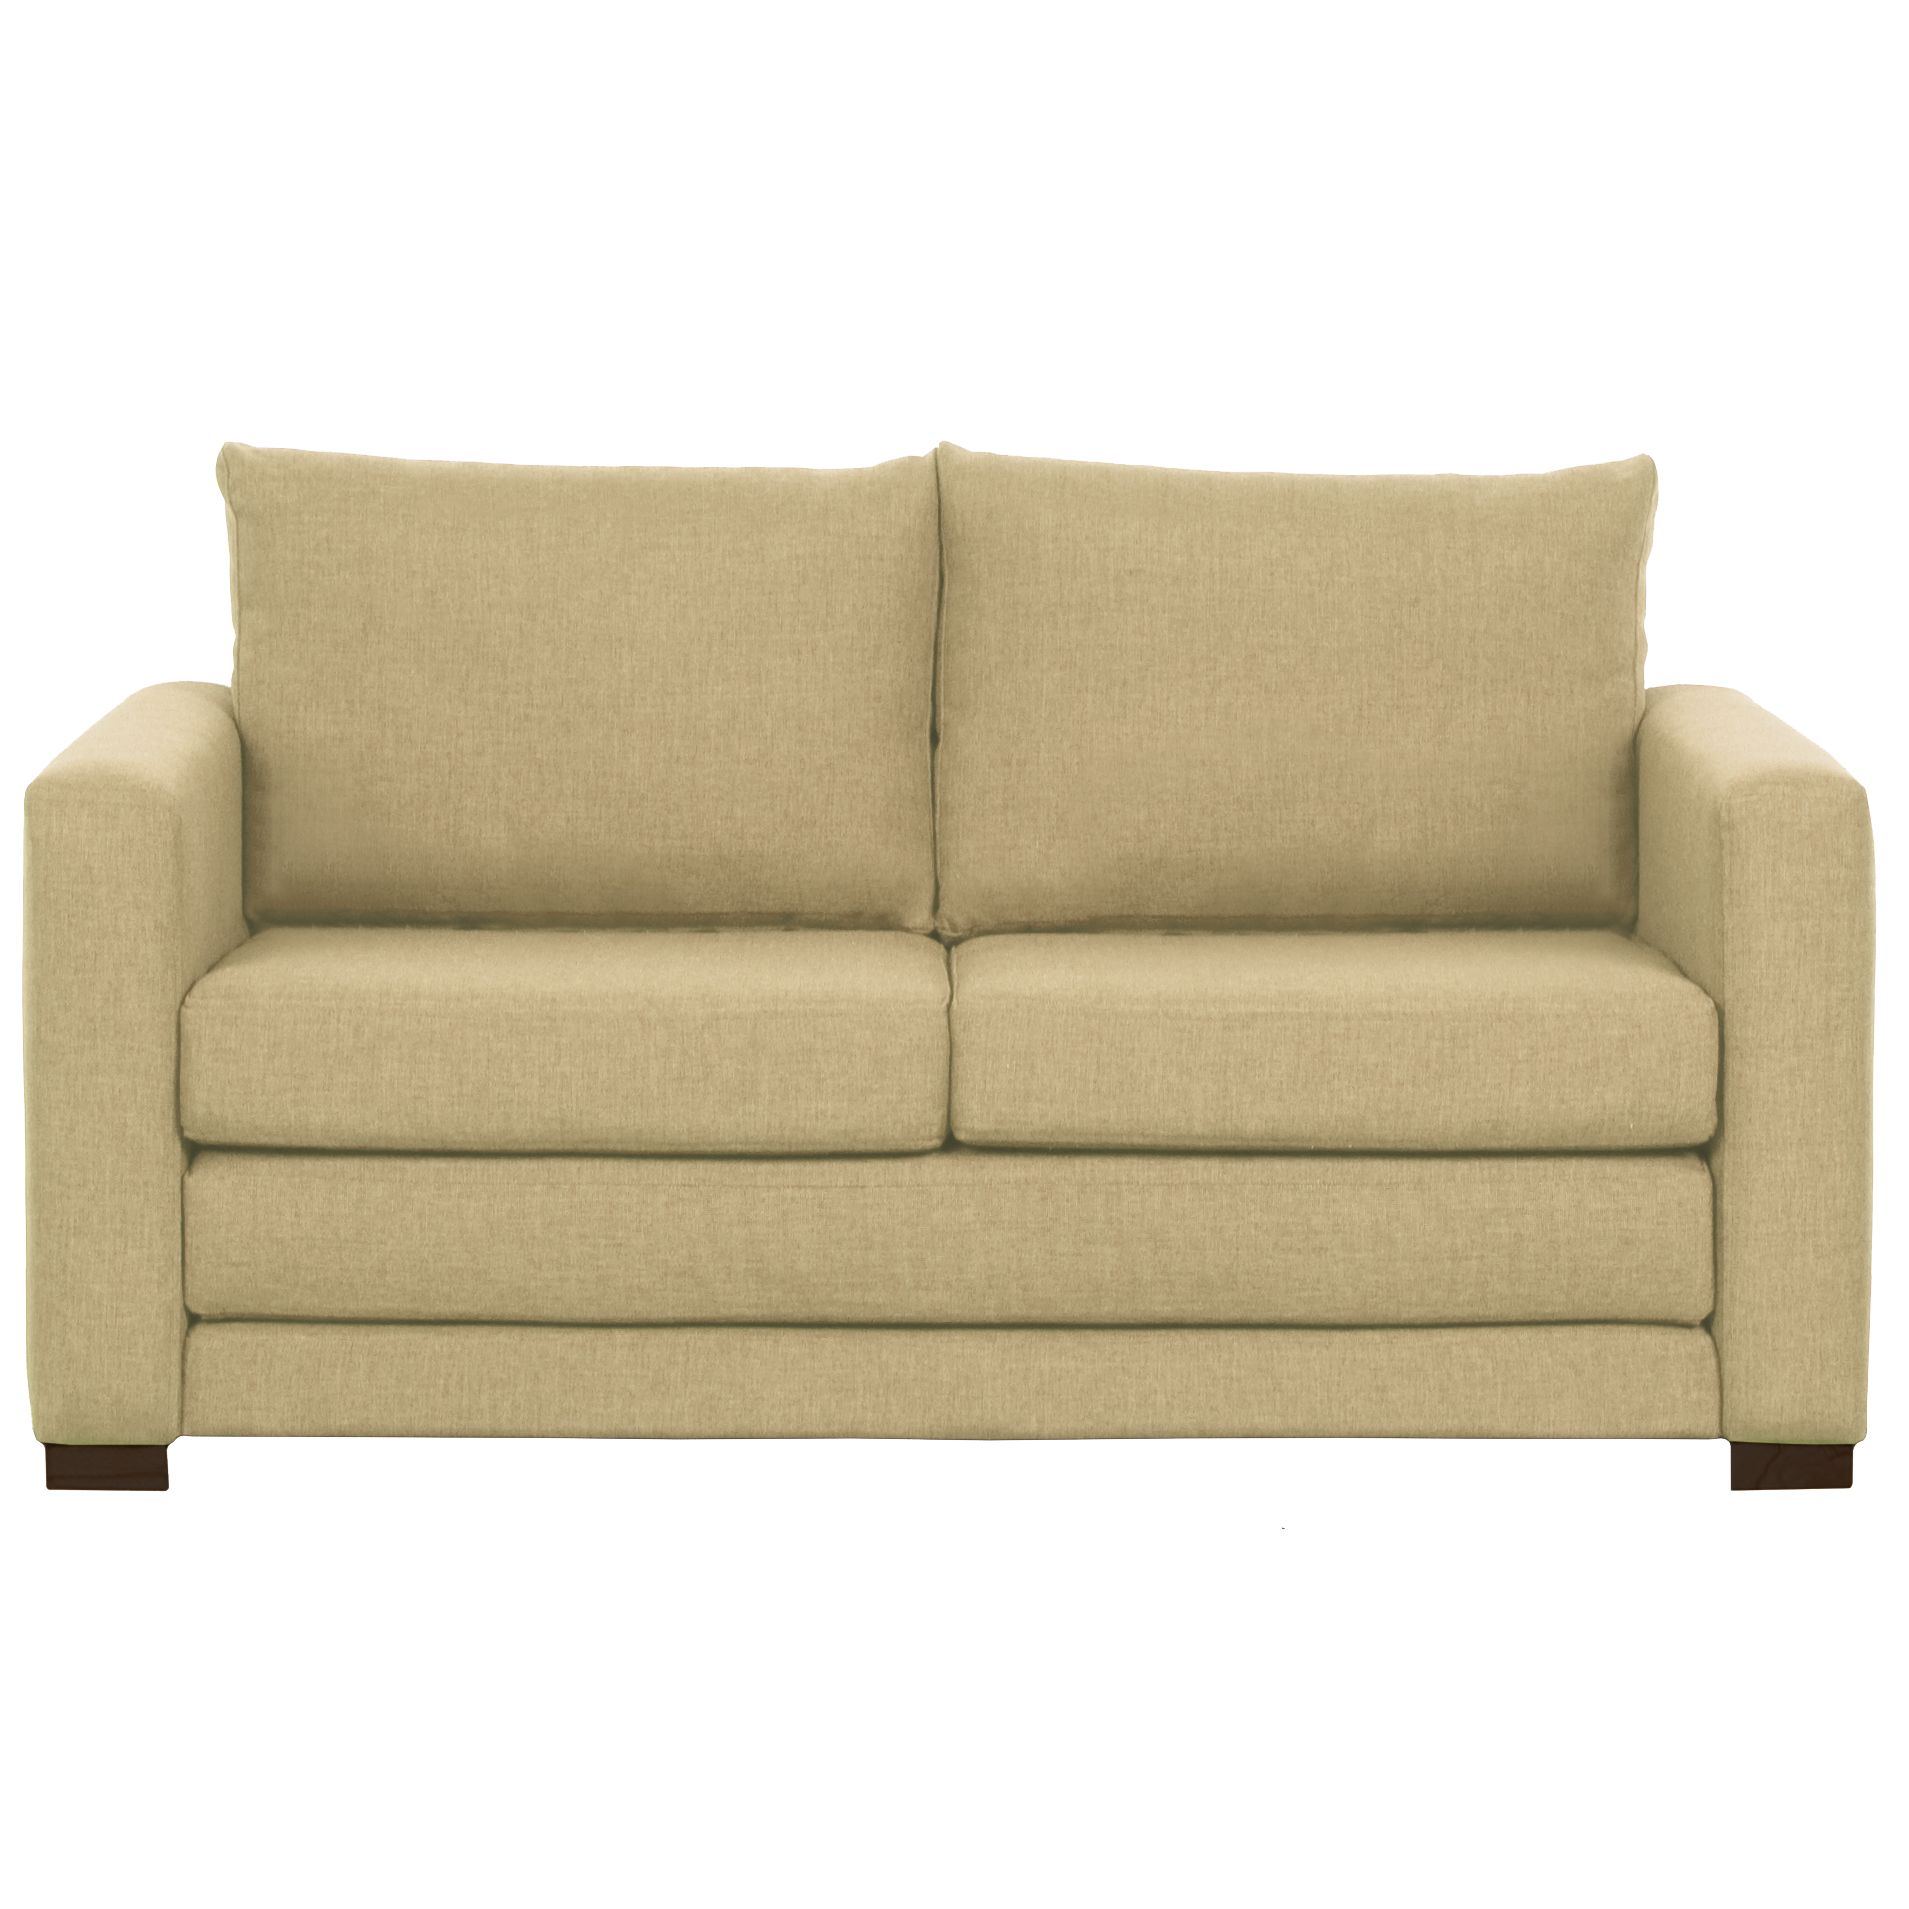 asda sofa beds uk asda sofa beds sofa beds uk asda